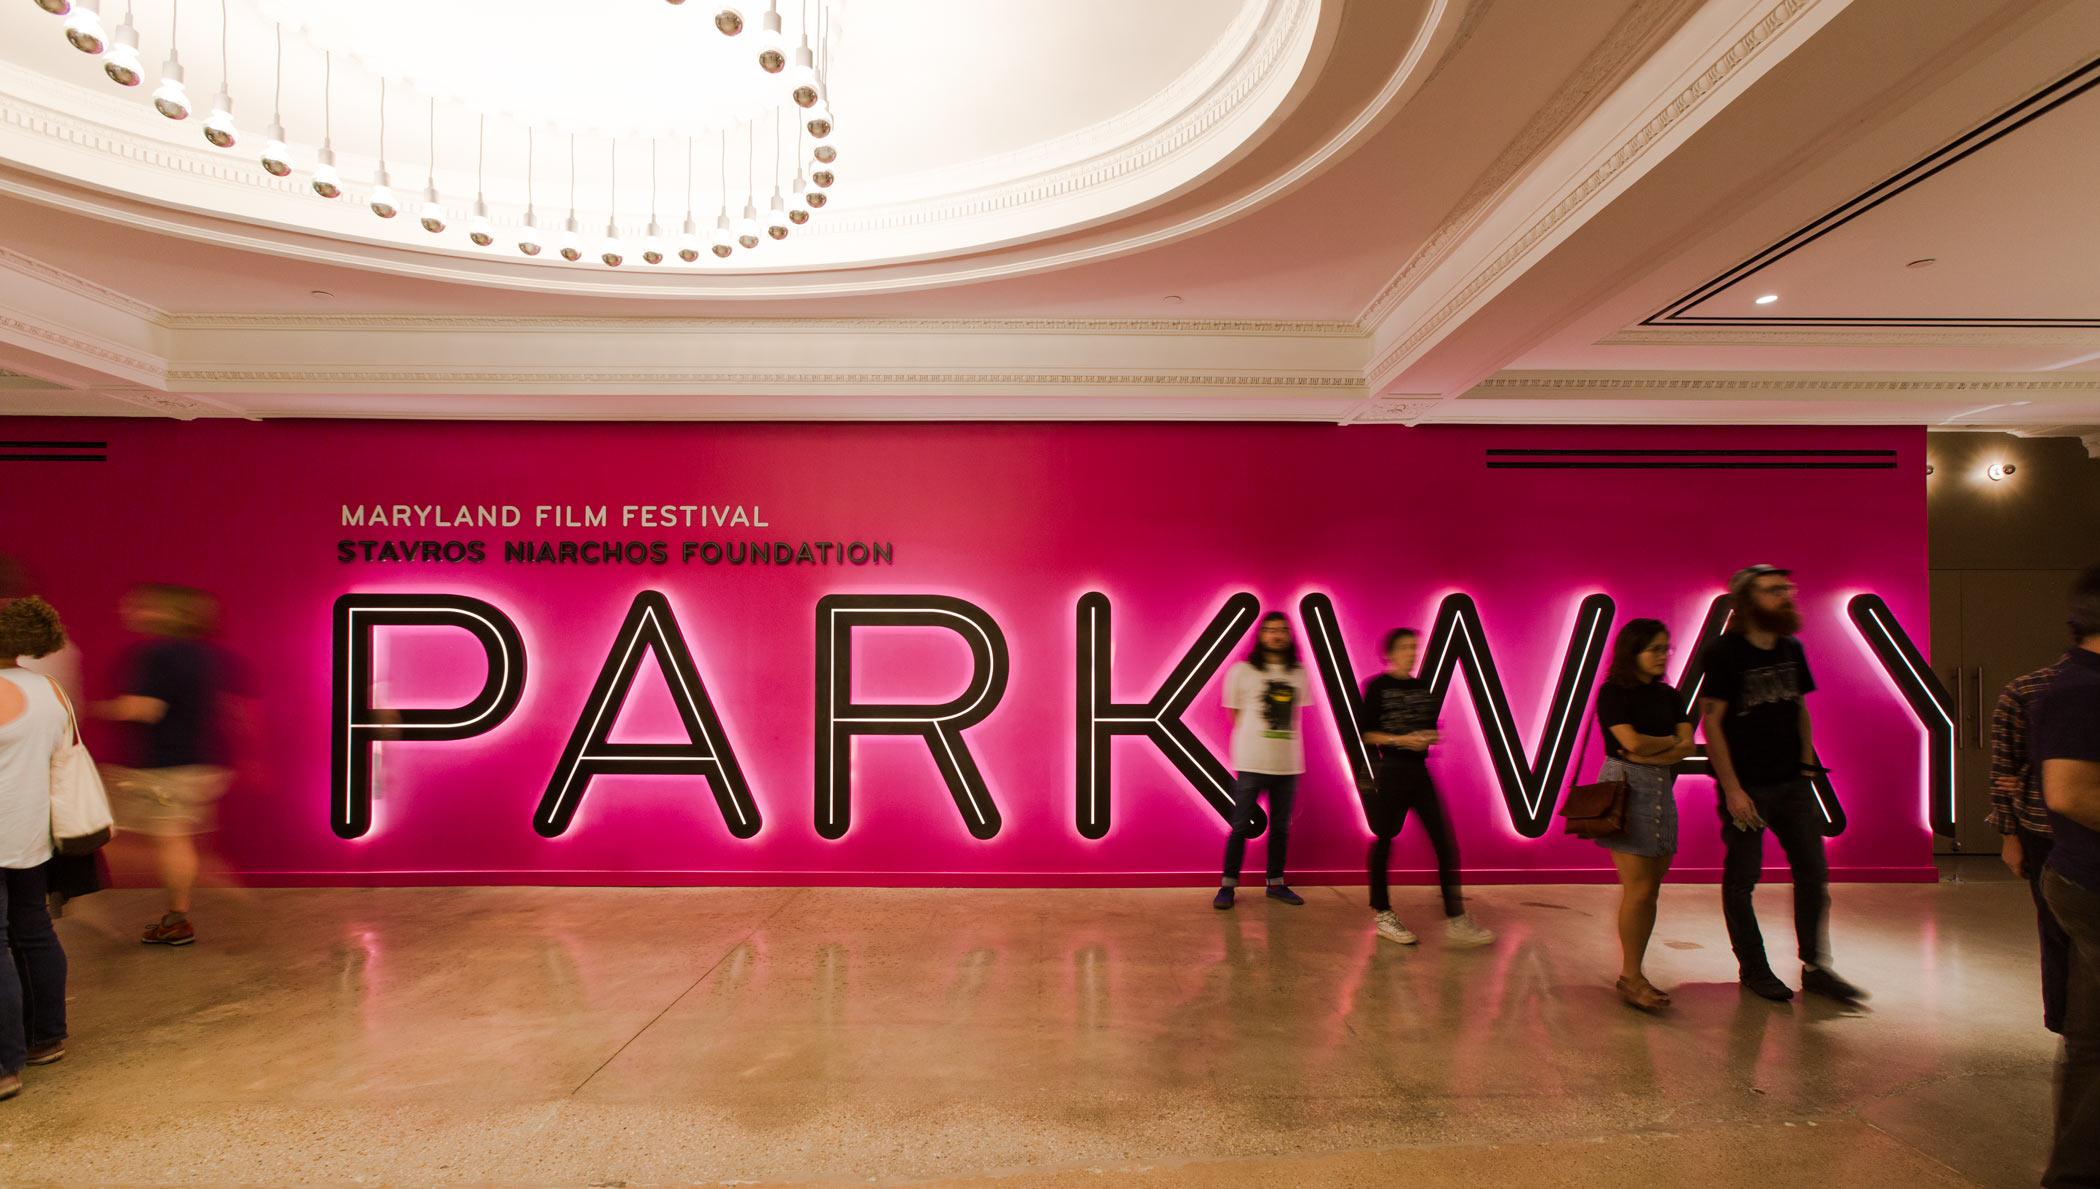 Parkway.Lobby_wall_straight1.jpg